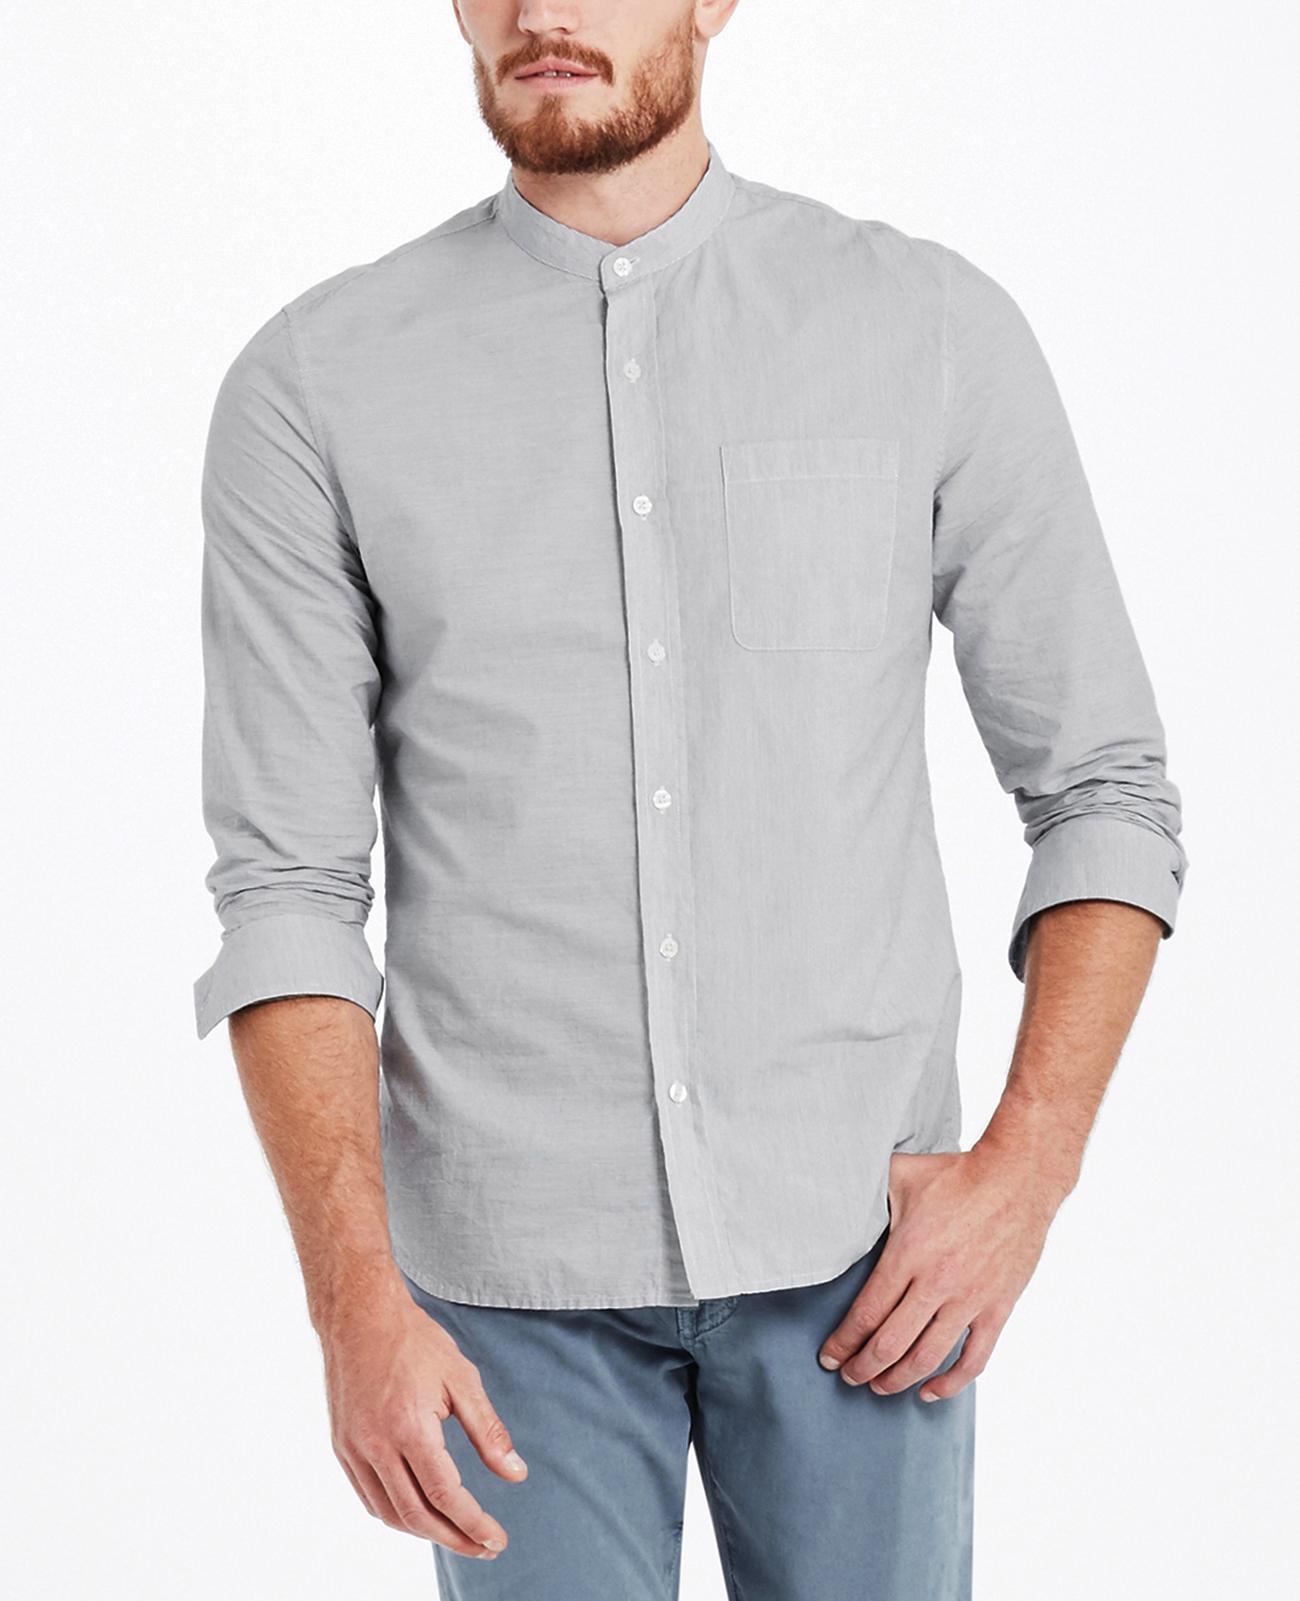 The Coast Shirt